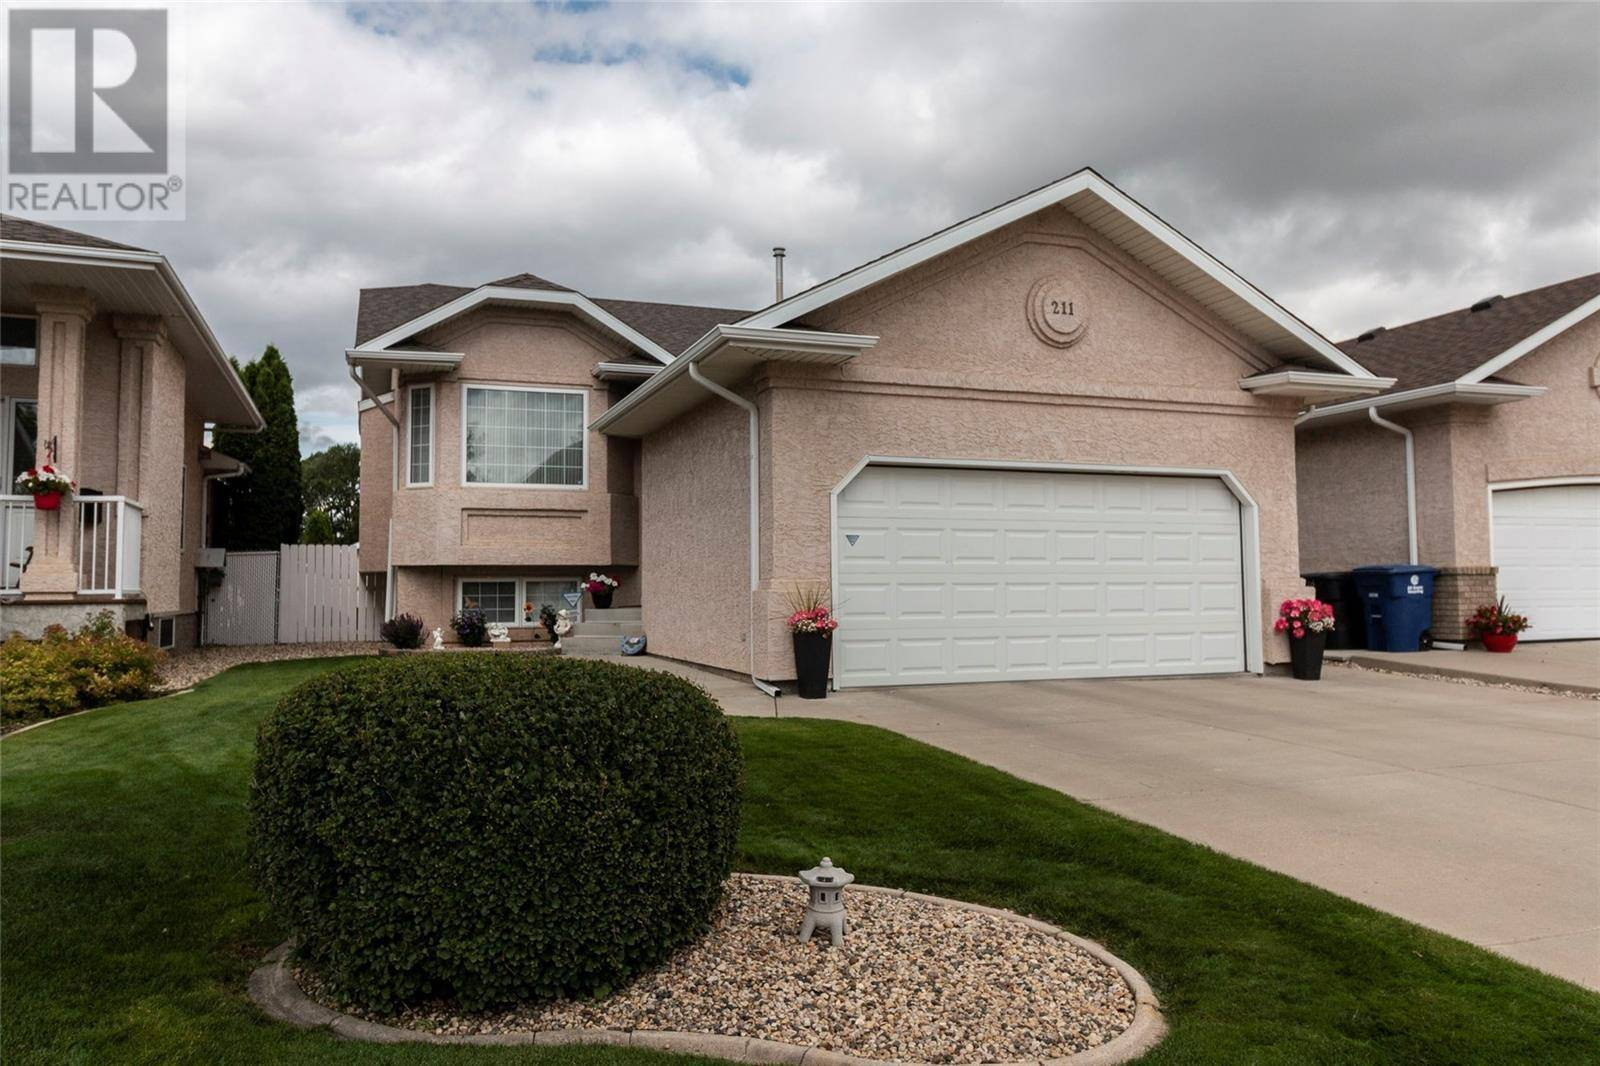 House for sale at 211 Guenter  Saskatoon Saskatchewan - MLS: SK783781